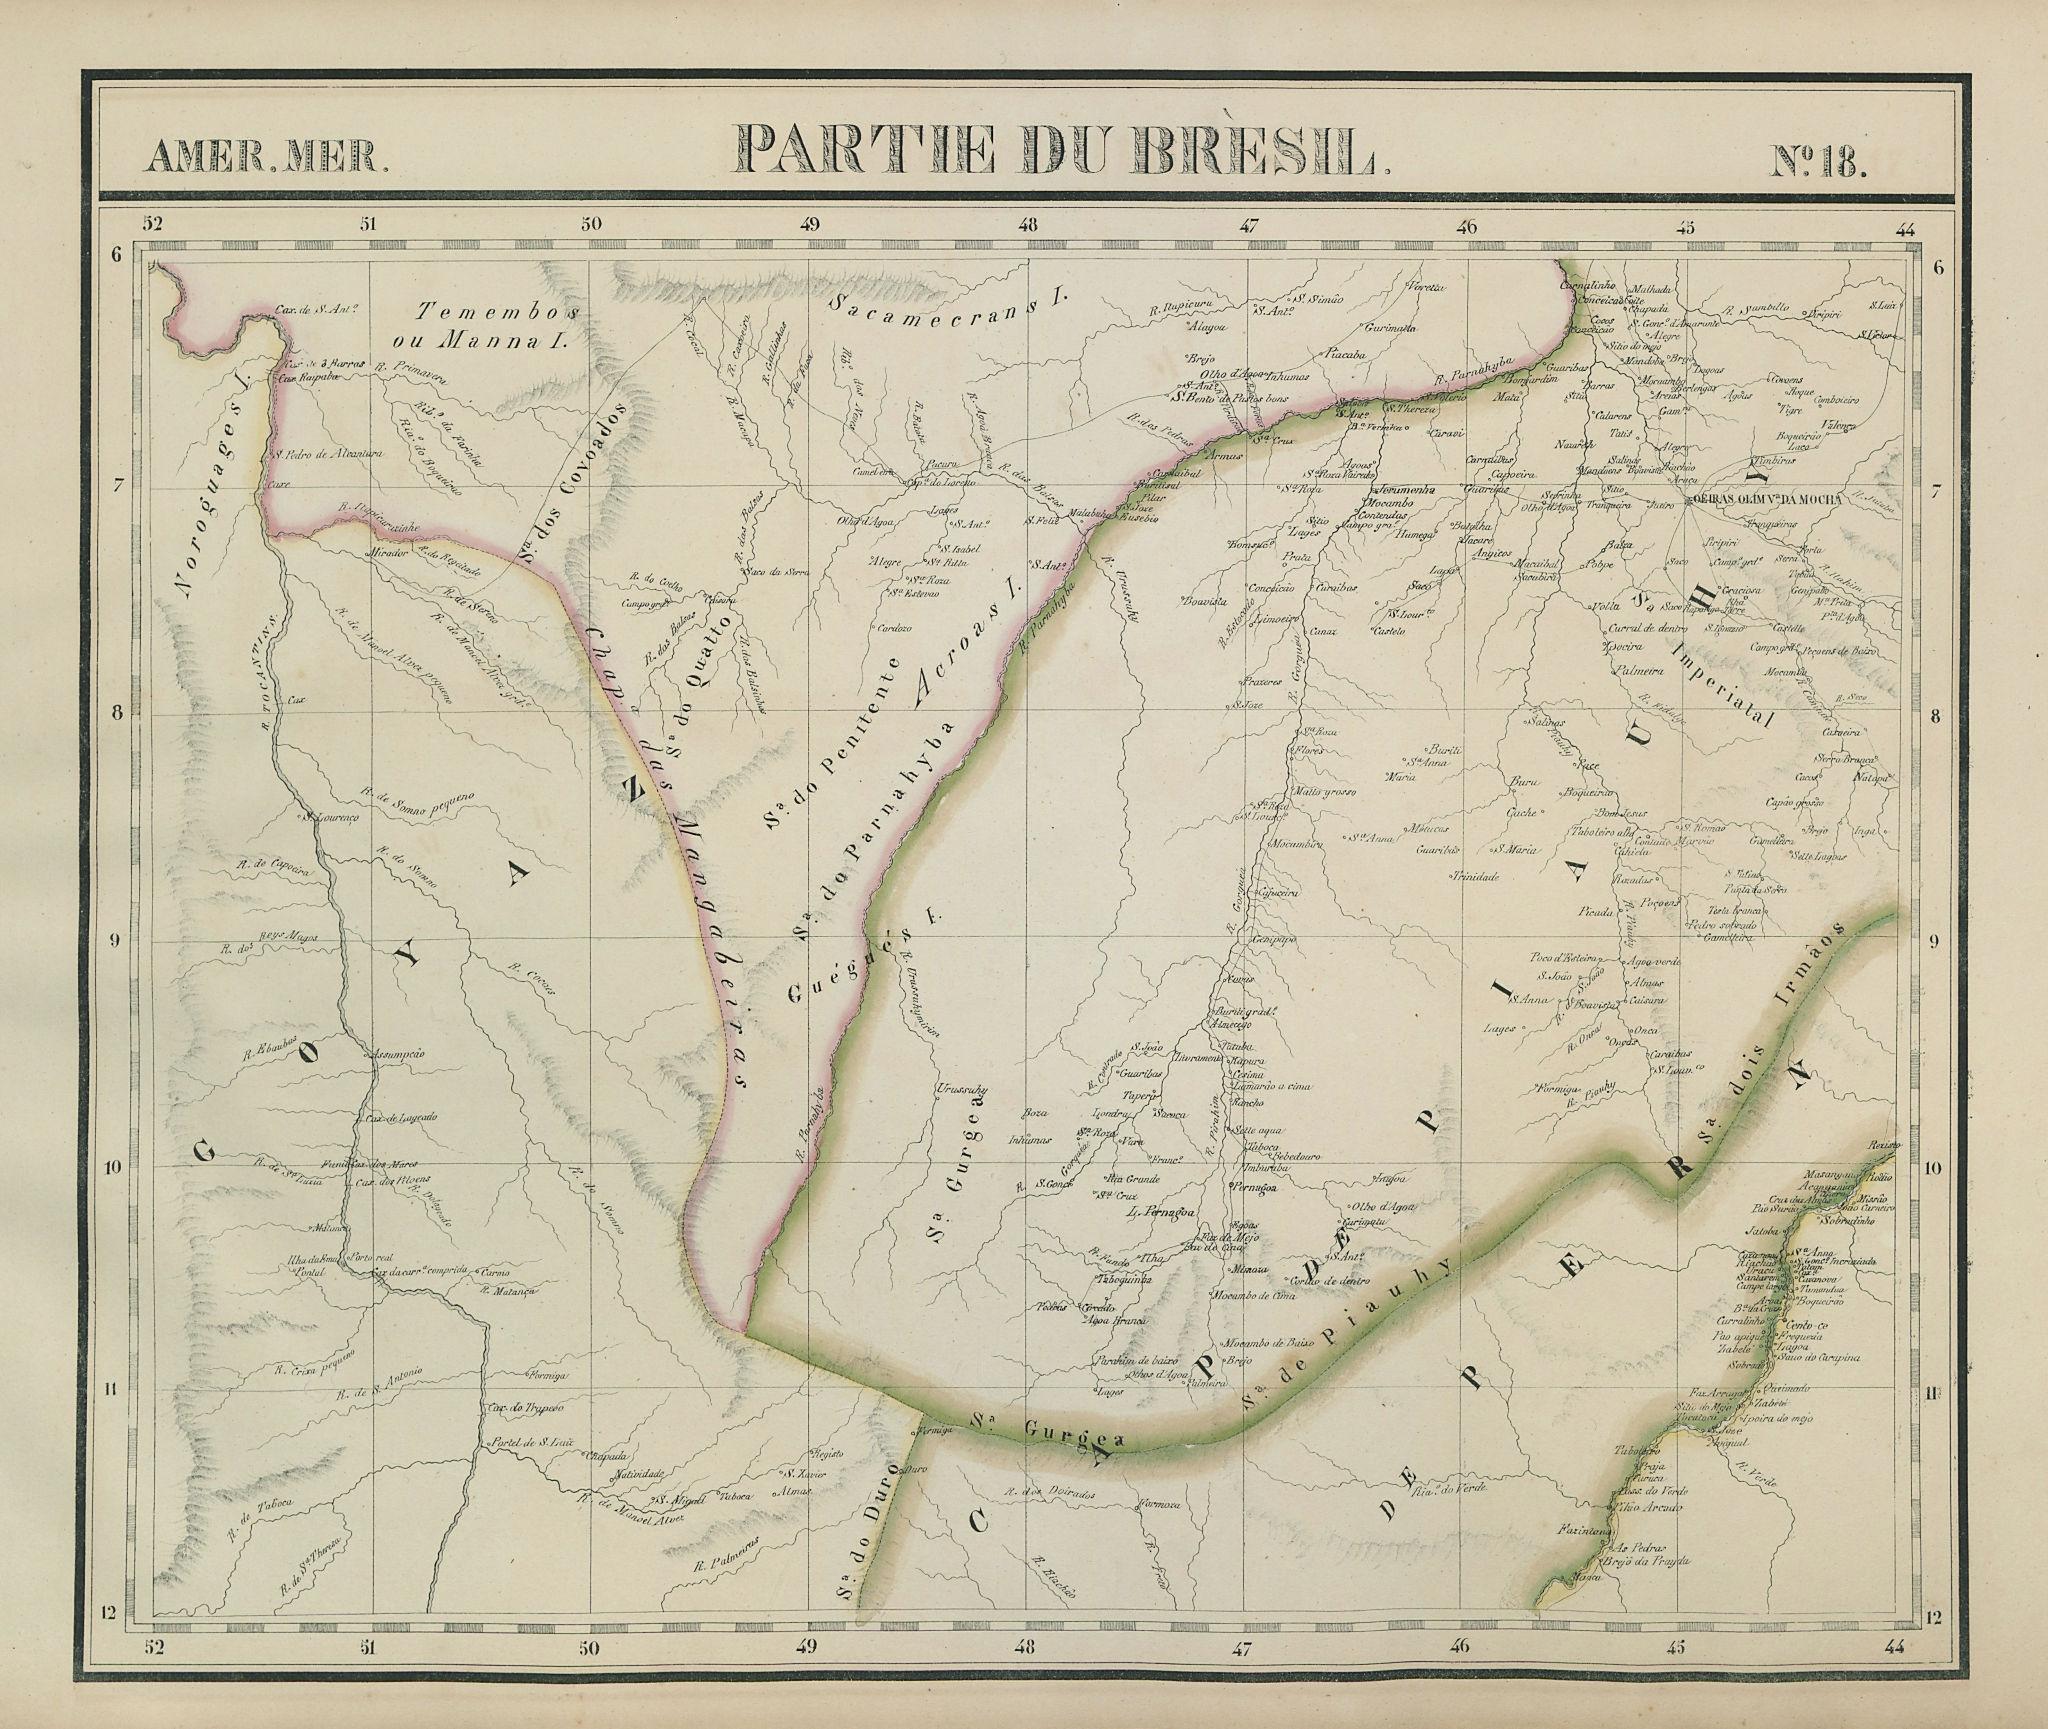 Amér. Mér. Brésil #18 North-central Brazil. PA TO BA MA PI VANDERMAELEN 1827 map